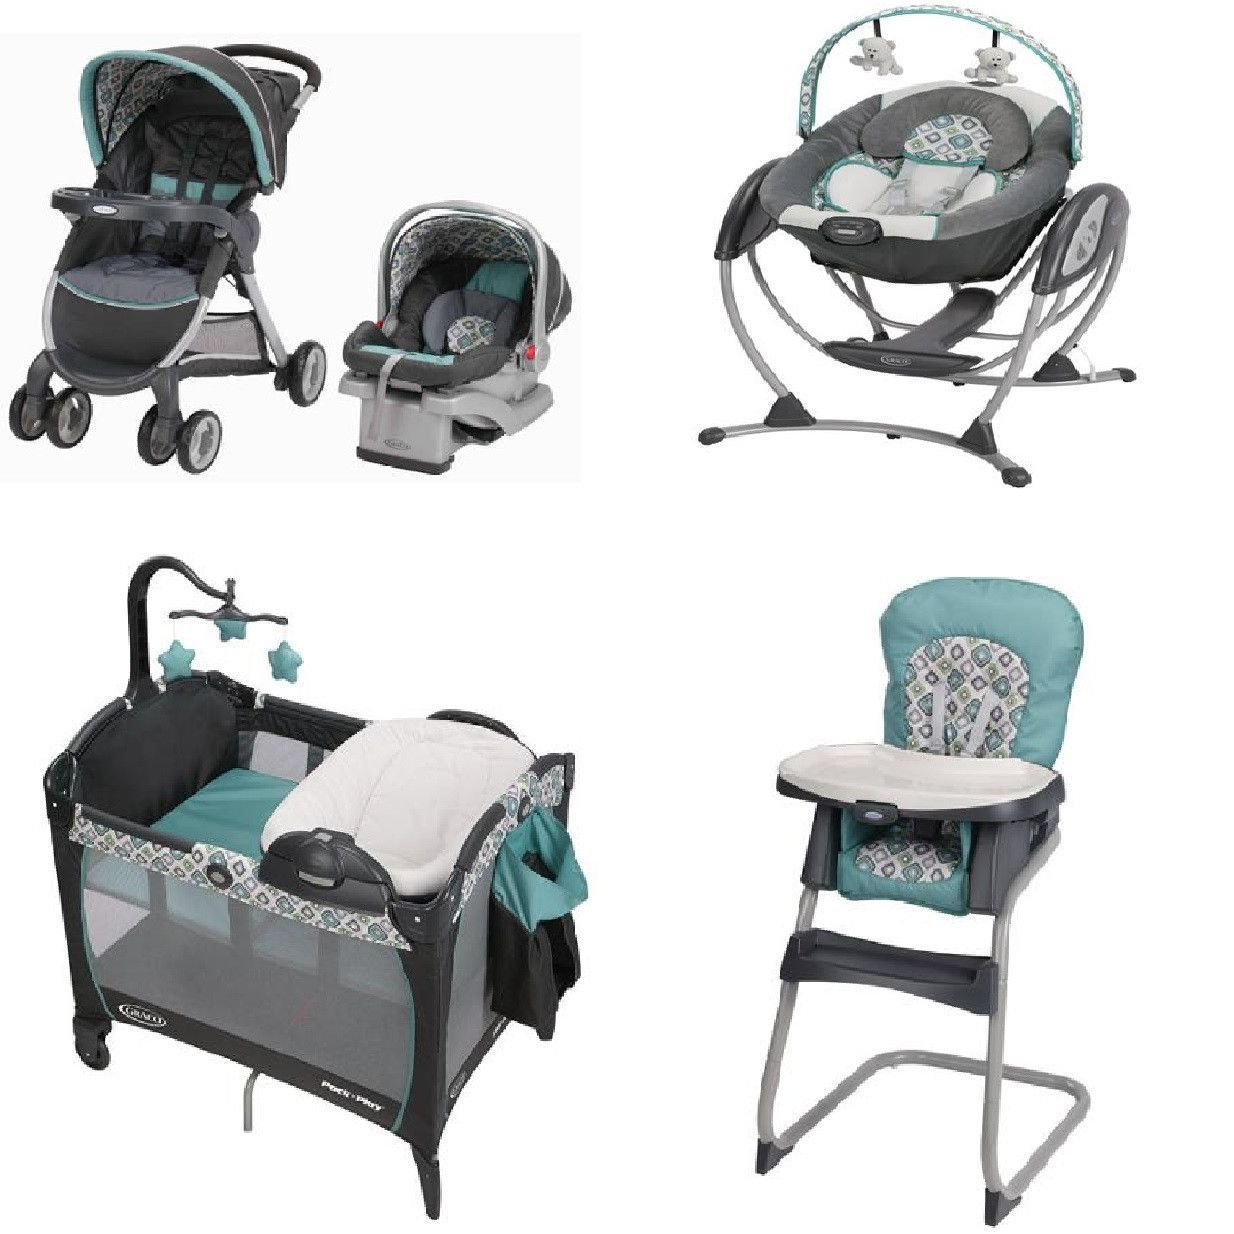 graco winnie the pooh high chair wheelchair hoist affinia blue complete baby gear bundle stroller